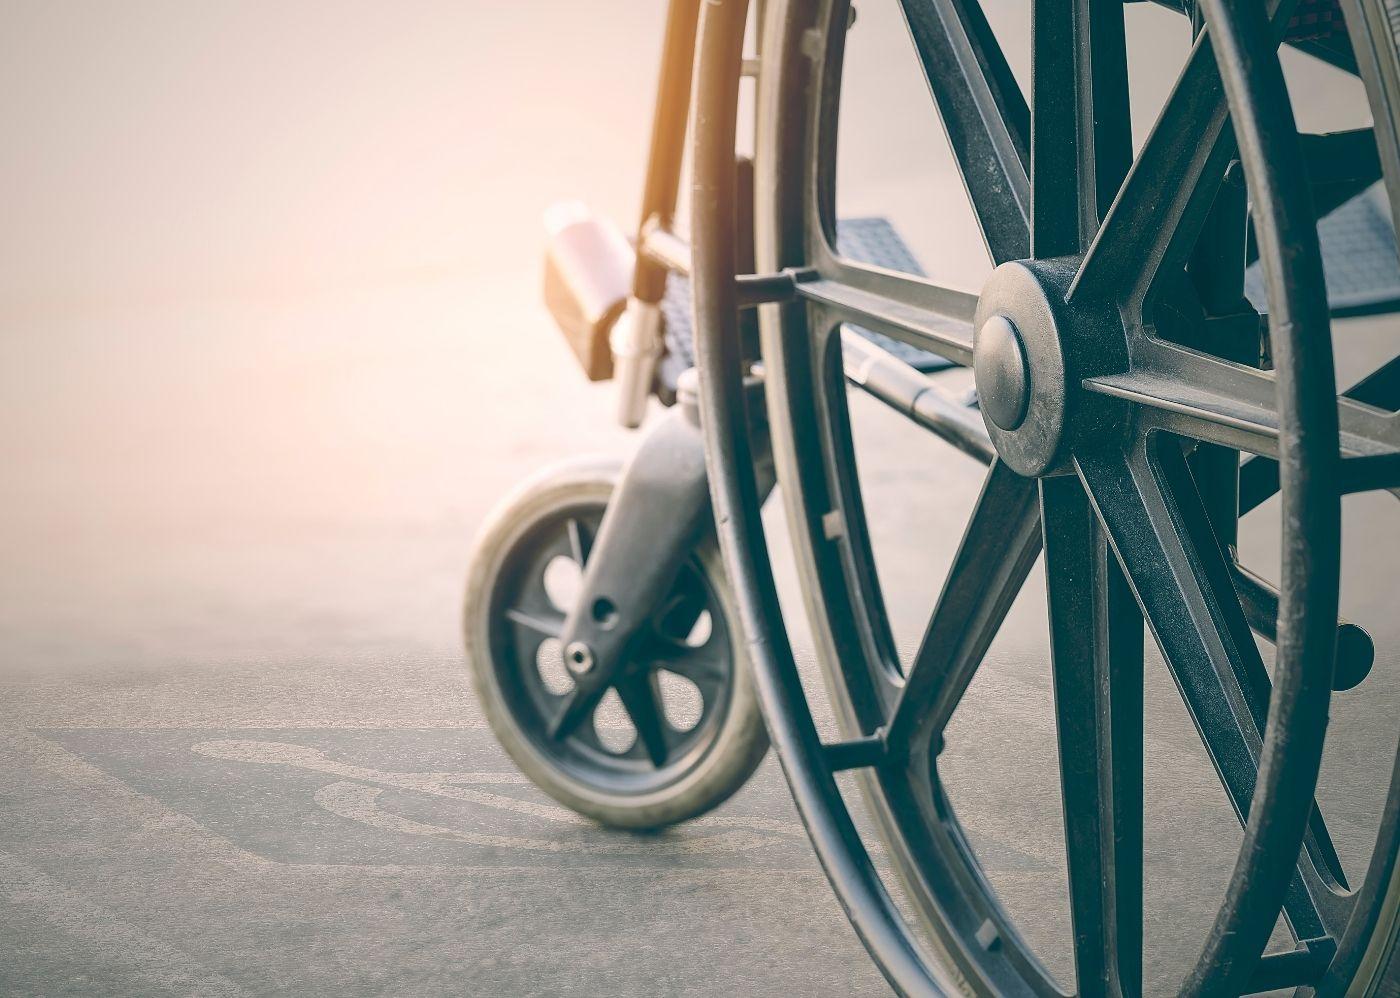 elektricke-voziky-v-silnicnim-zakone | Canva